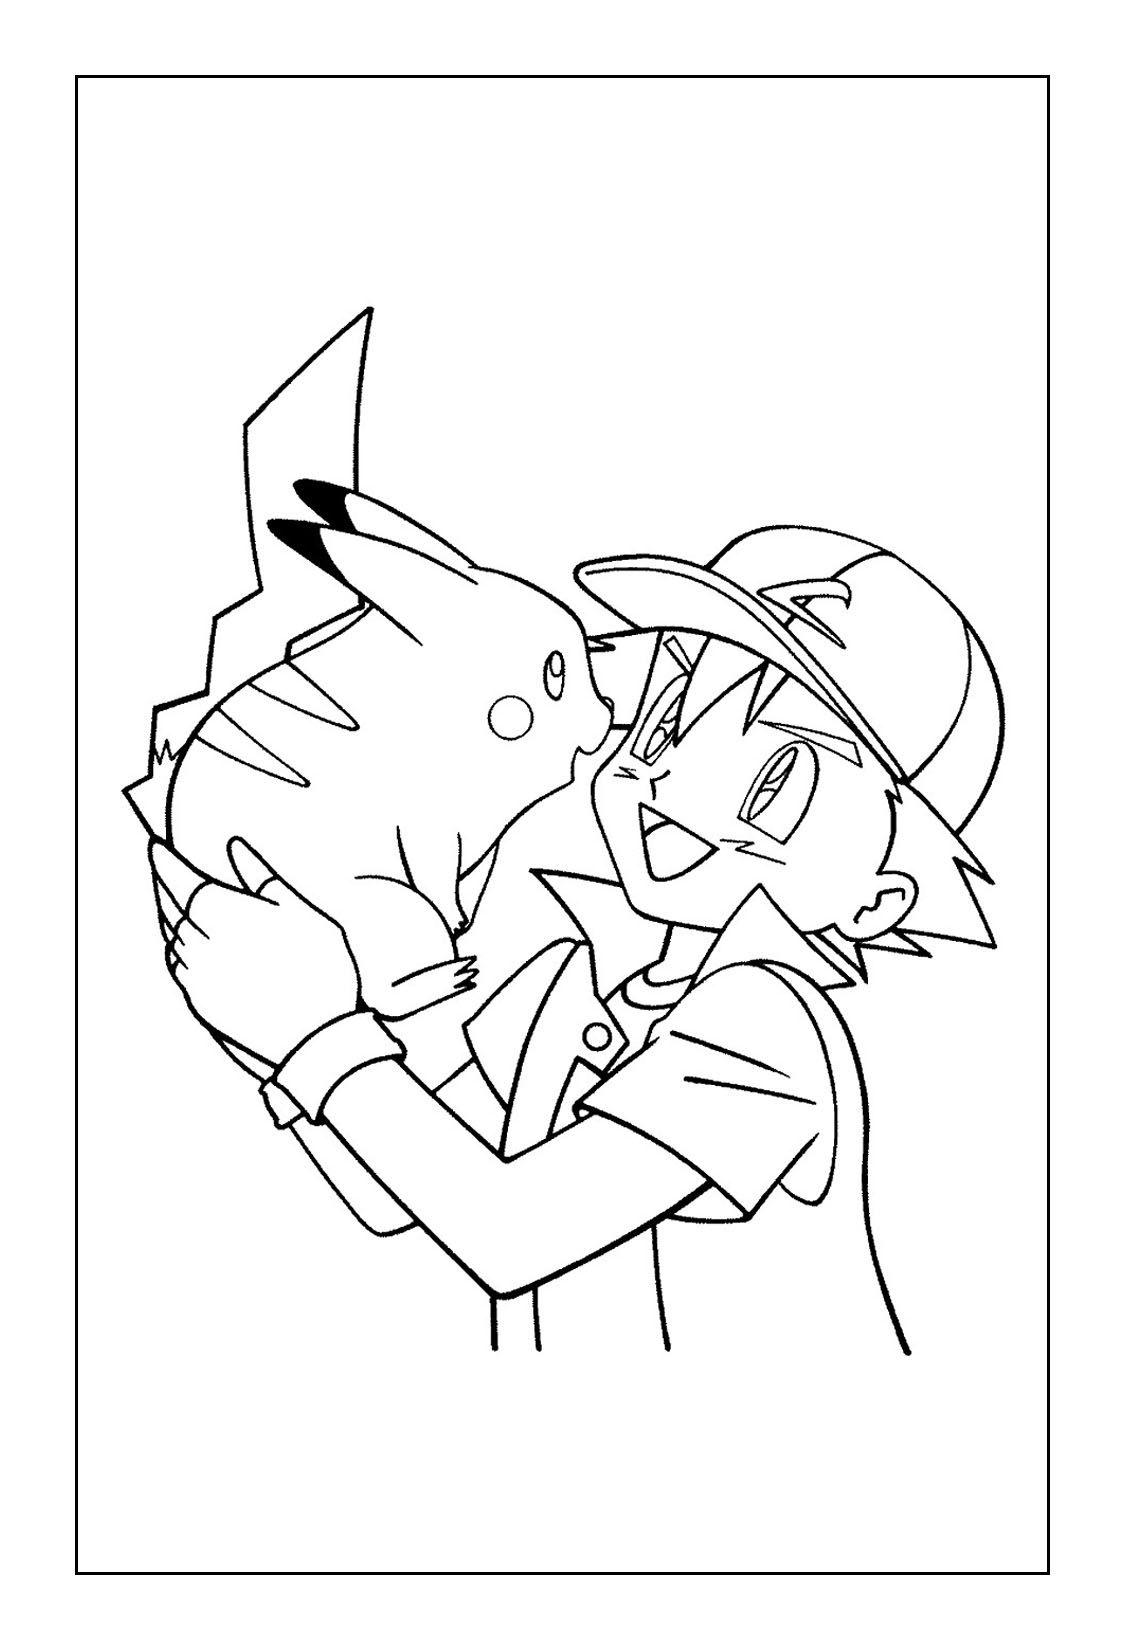 Printable Pikachu Coloring Pages Ash And Pikachu Pikachu